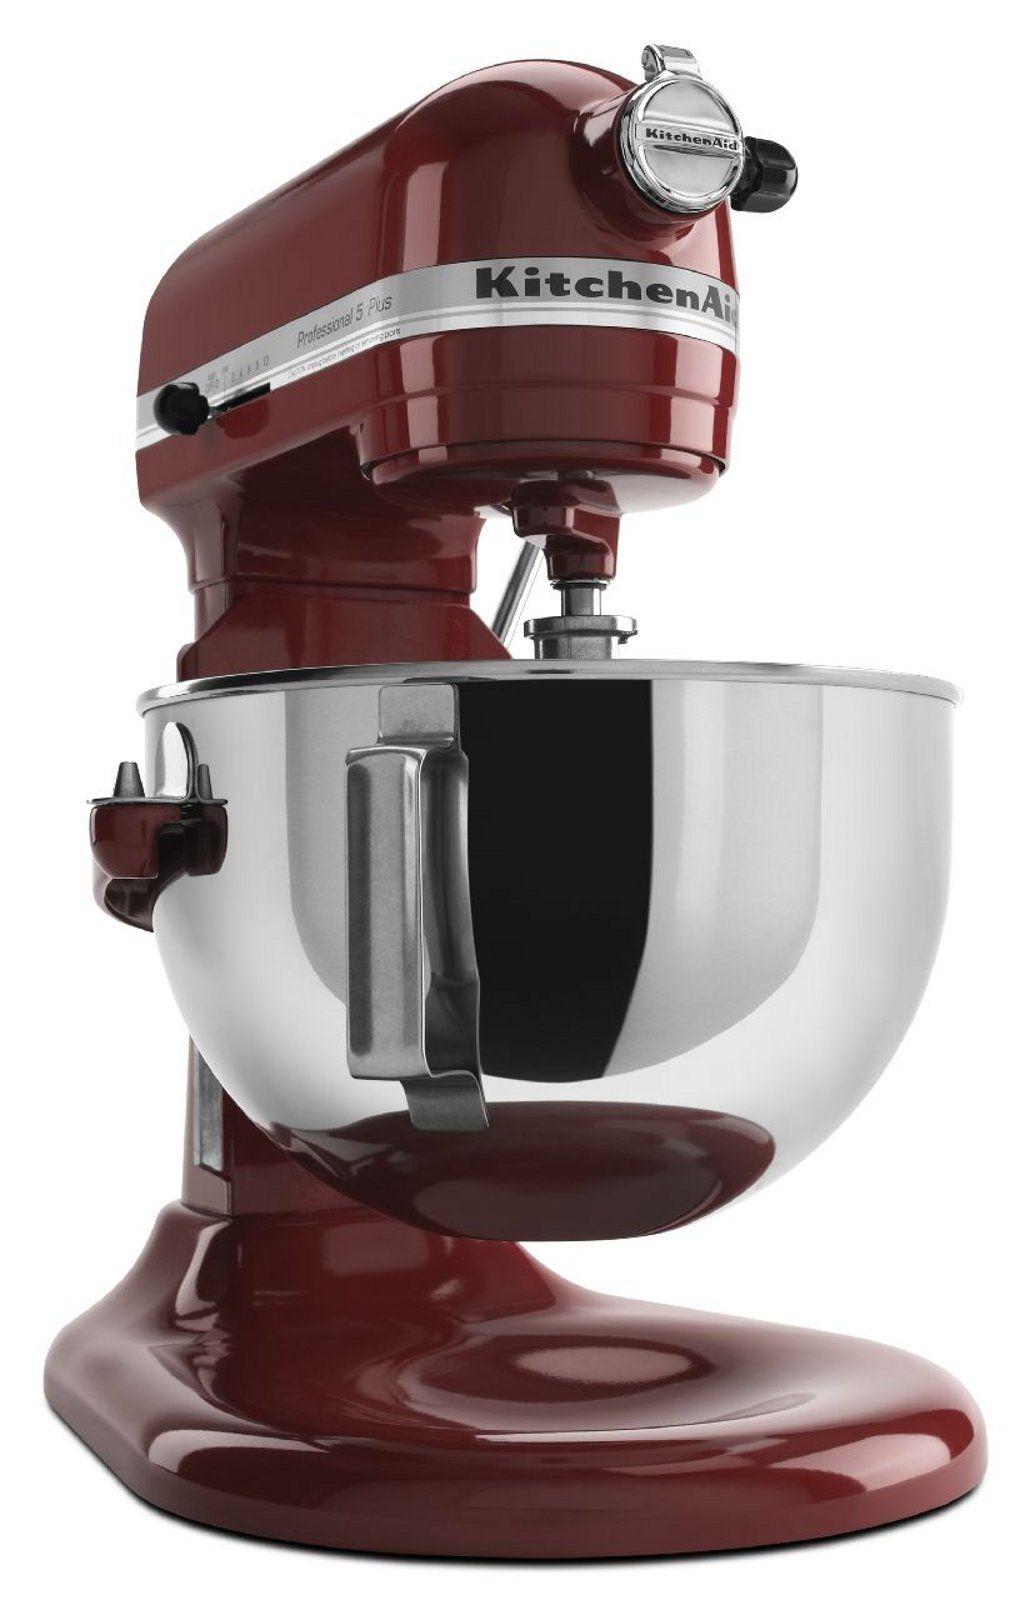 Kitchenaid Professional Plus 5 Qt Stand Mixer Gloss Cinnamon